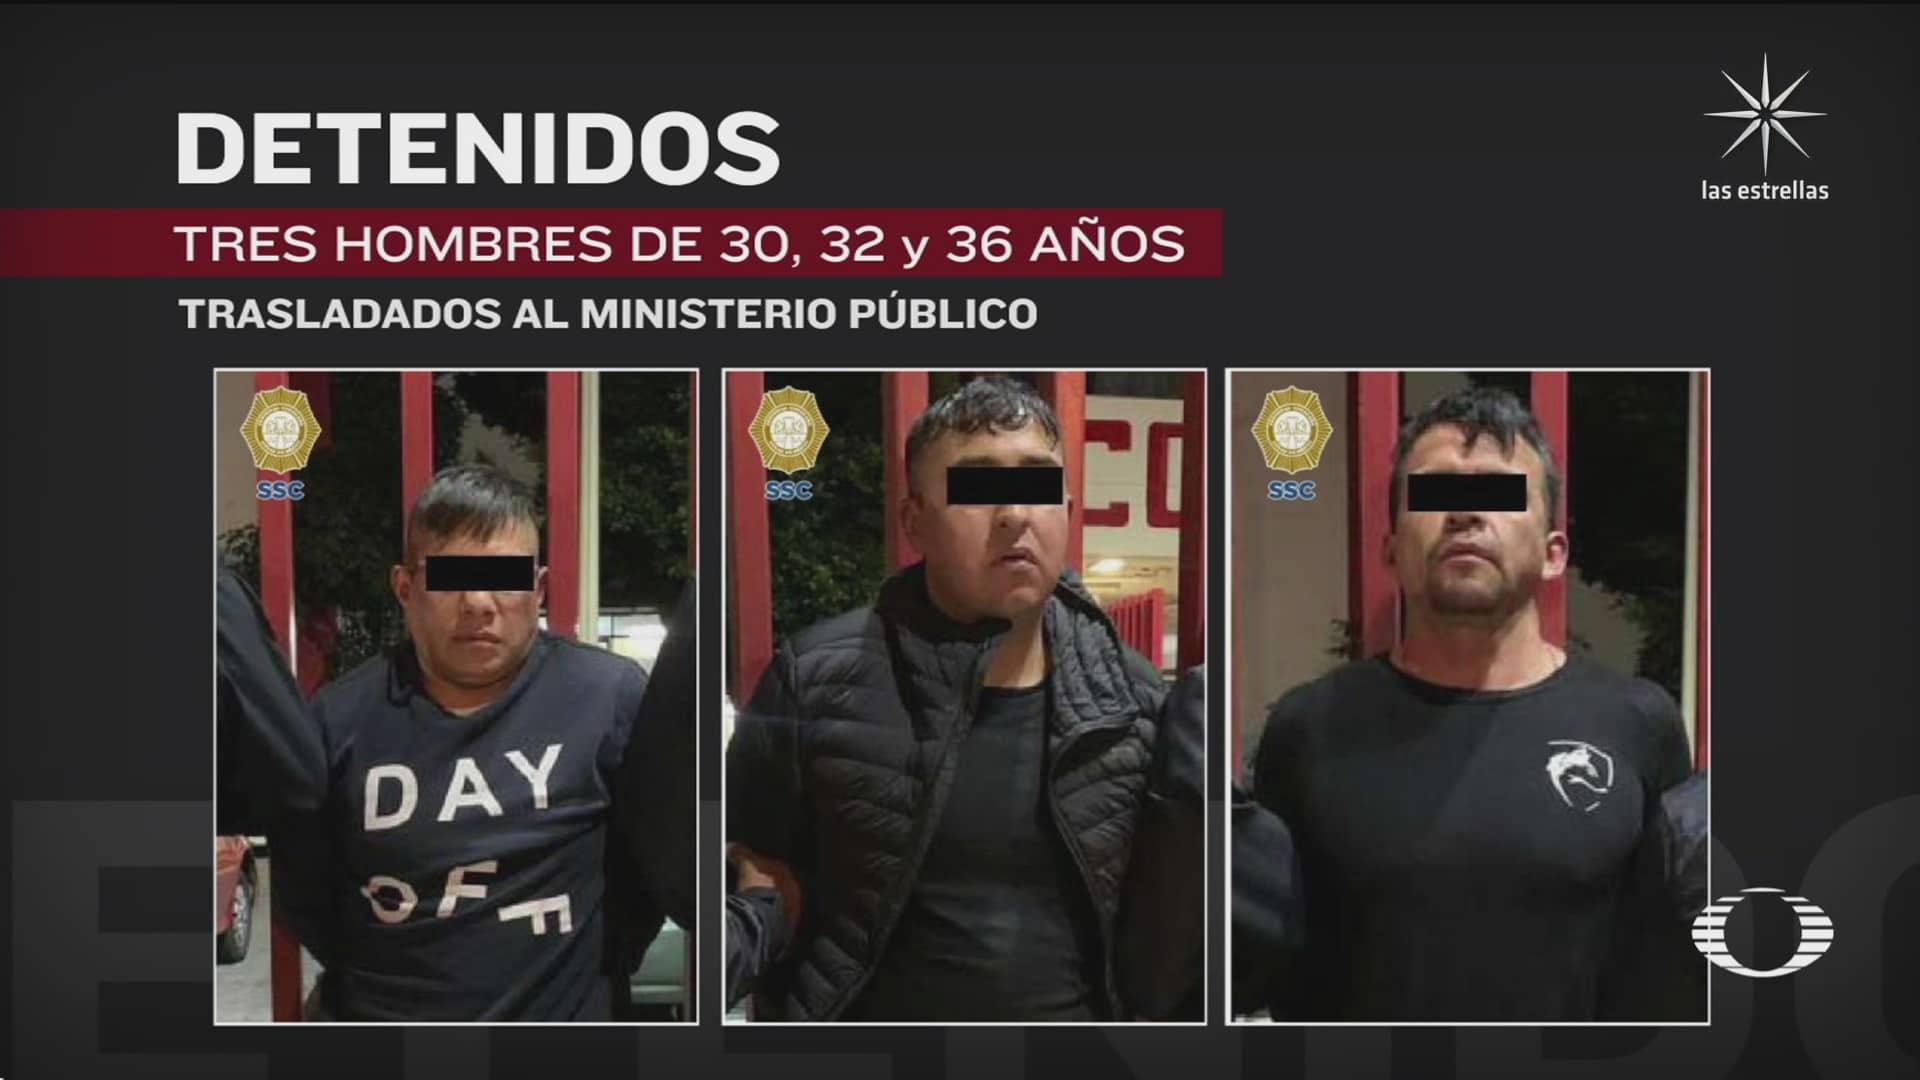 policia capitalina detiene a 3 hombres relacionados con disparos en partido de futbol en azcapotzalco